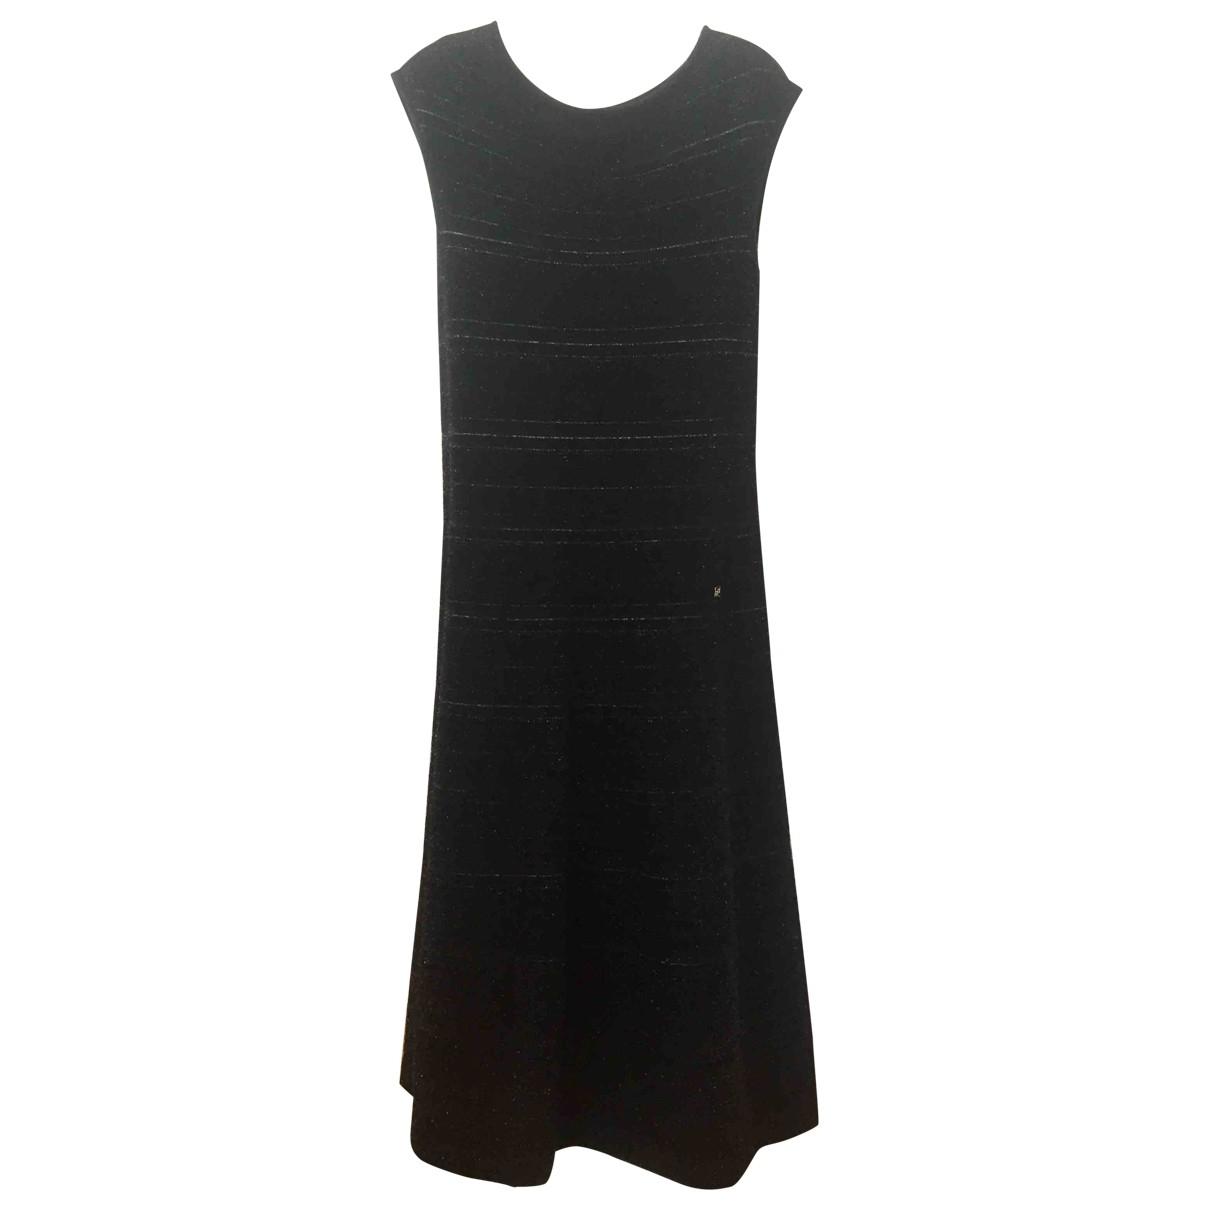 Carolina Herrera \N Black dress for Women XS International